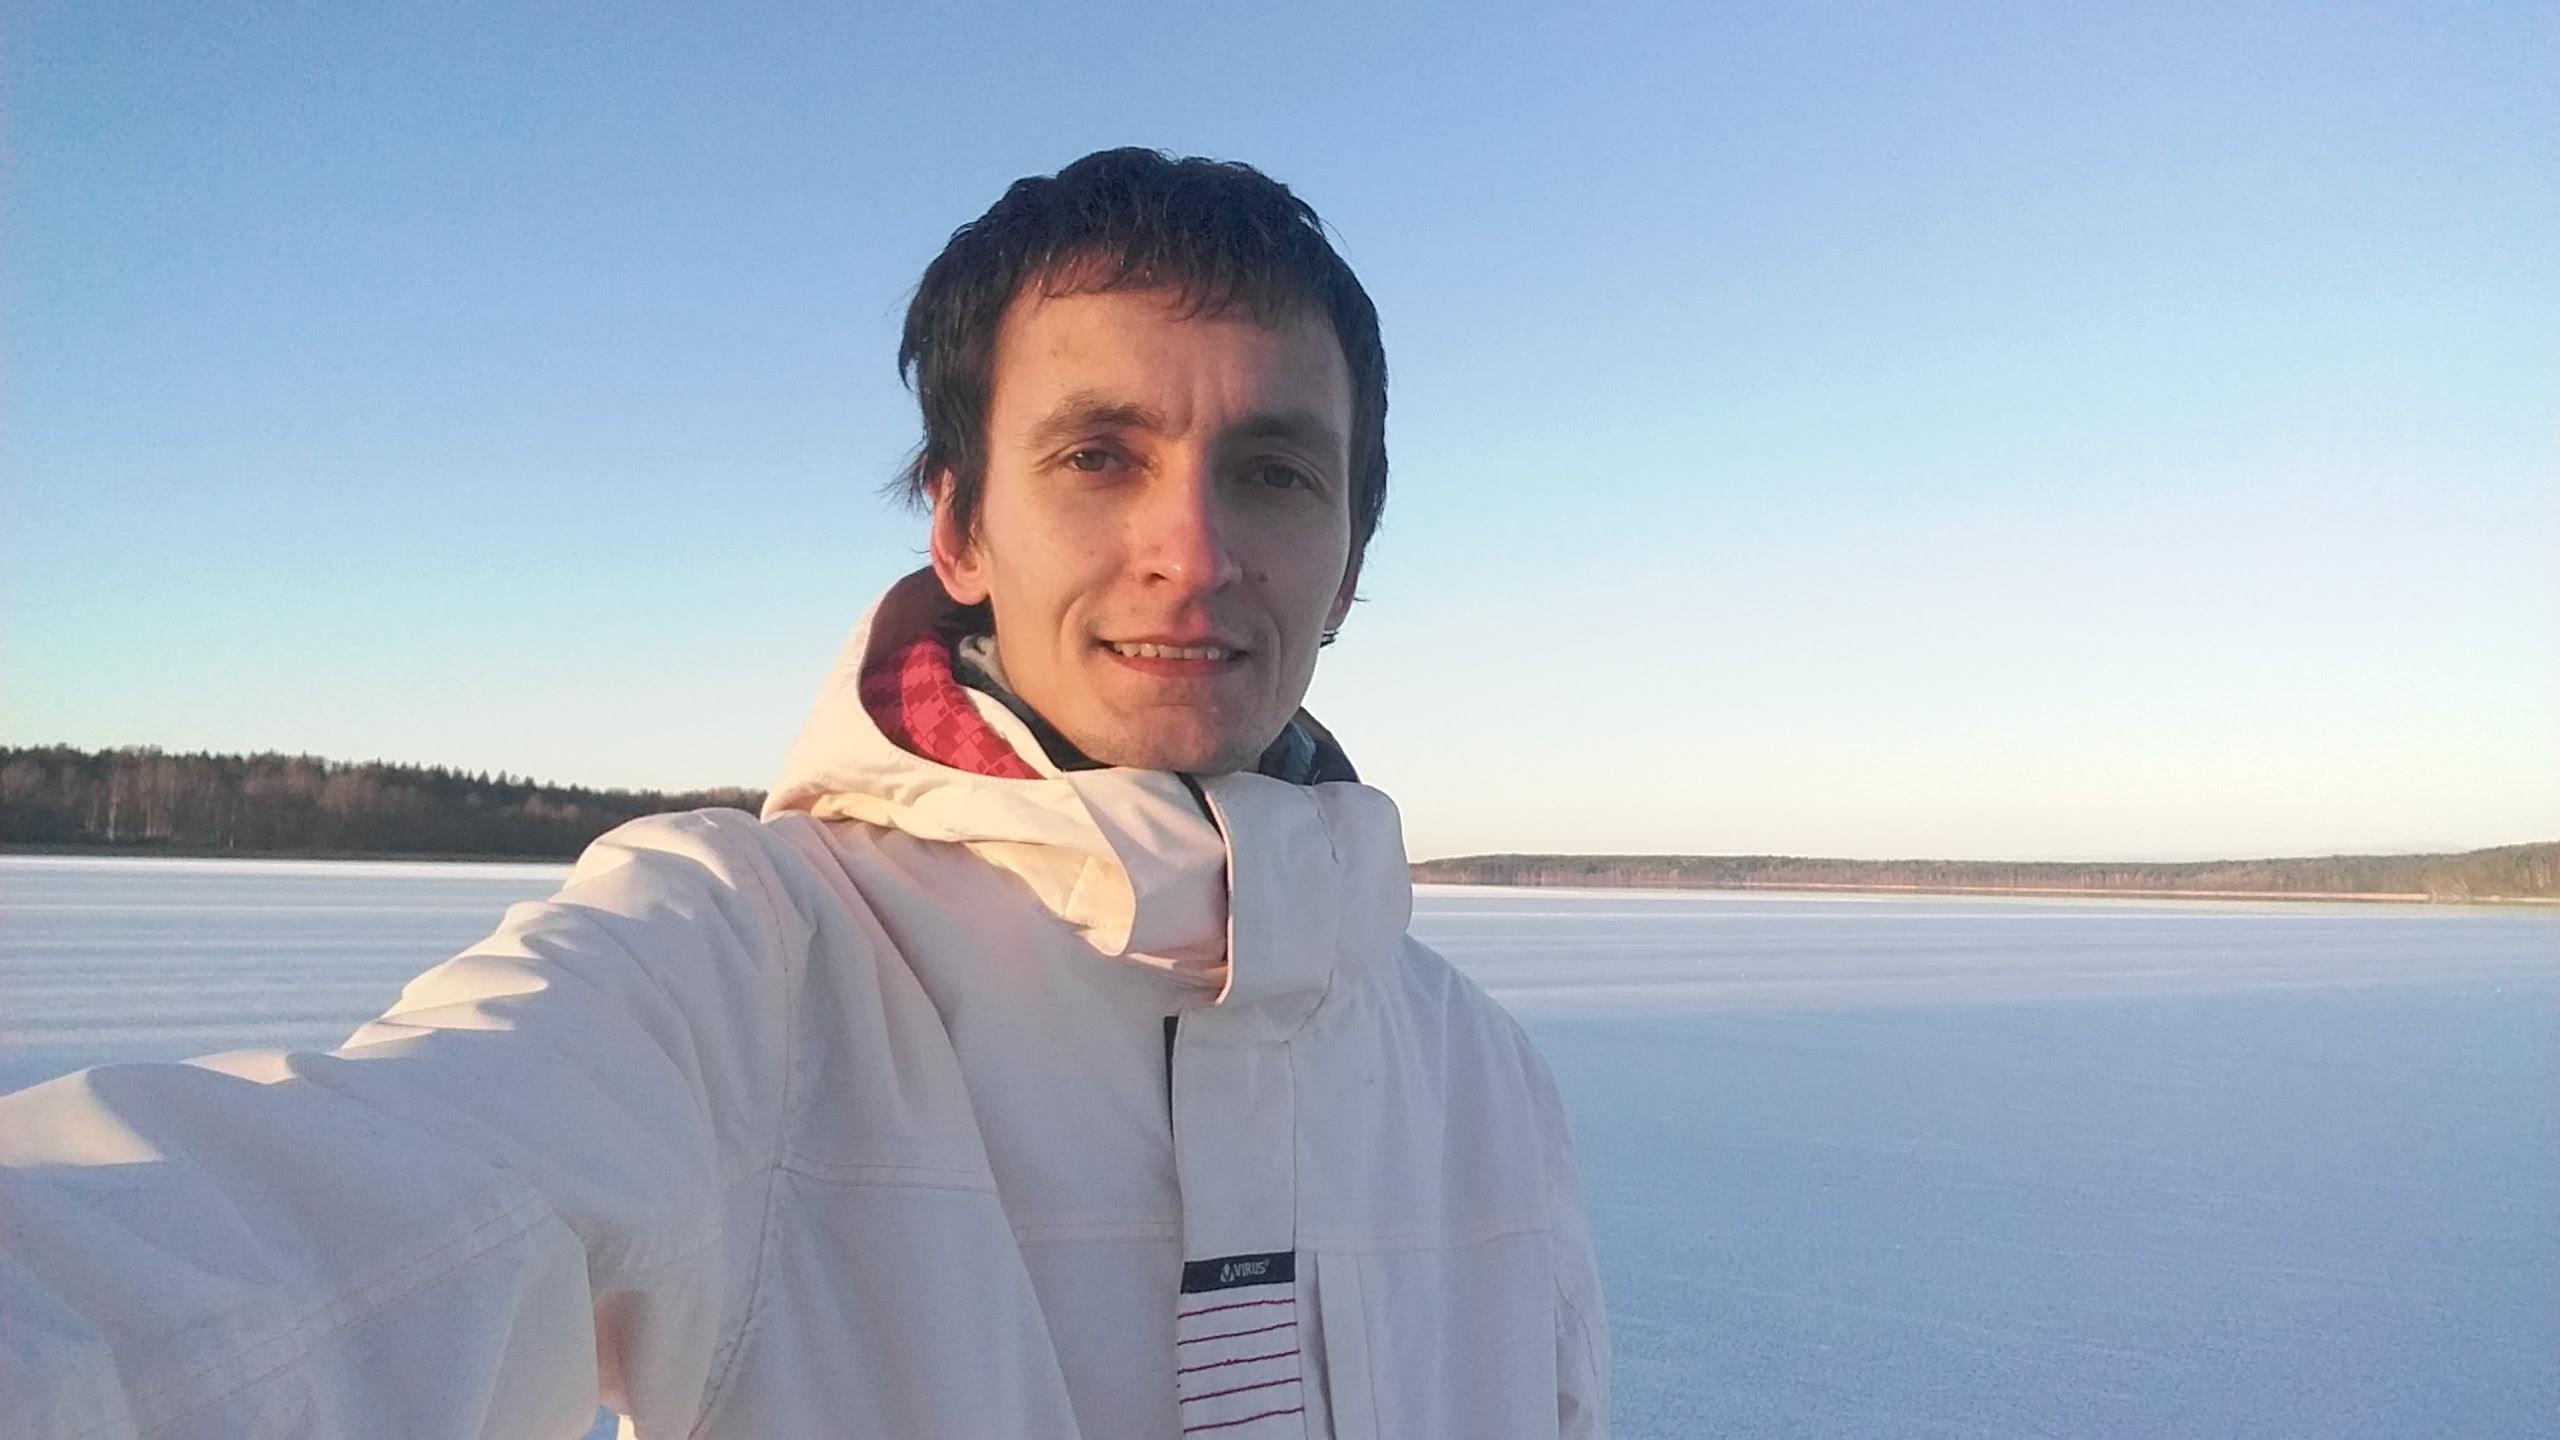 Андрей Терентьев